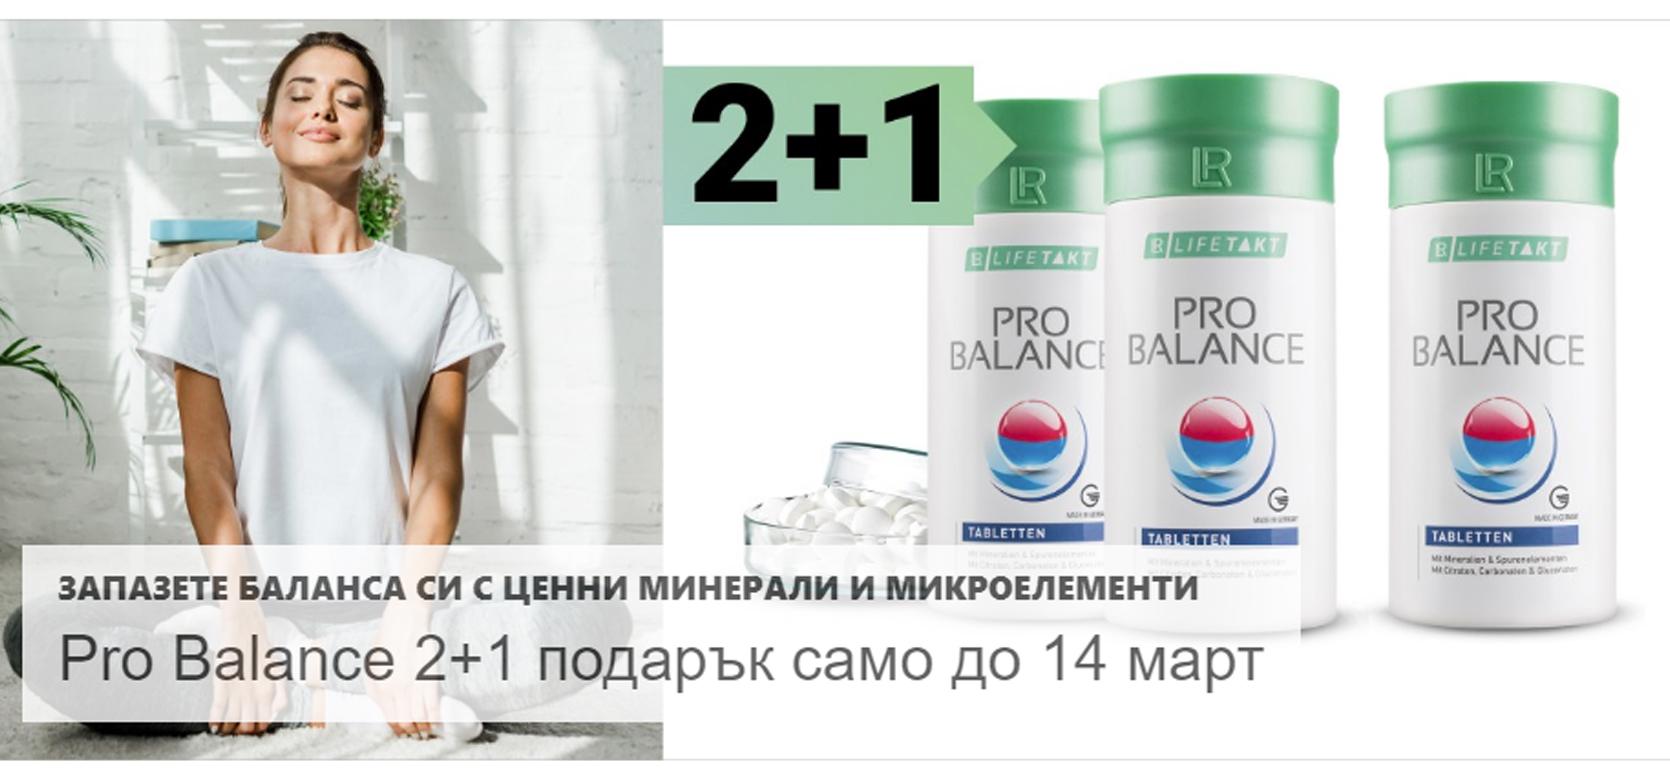 Probalance 2+1